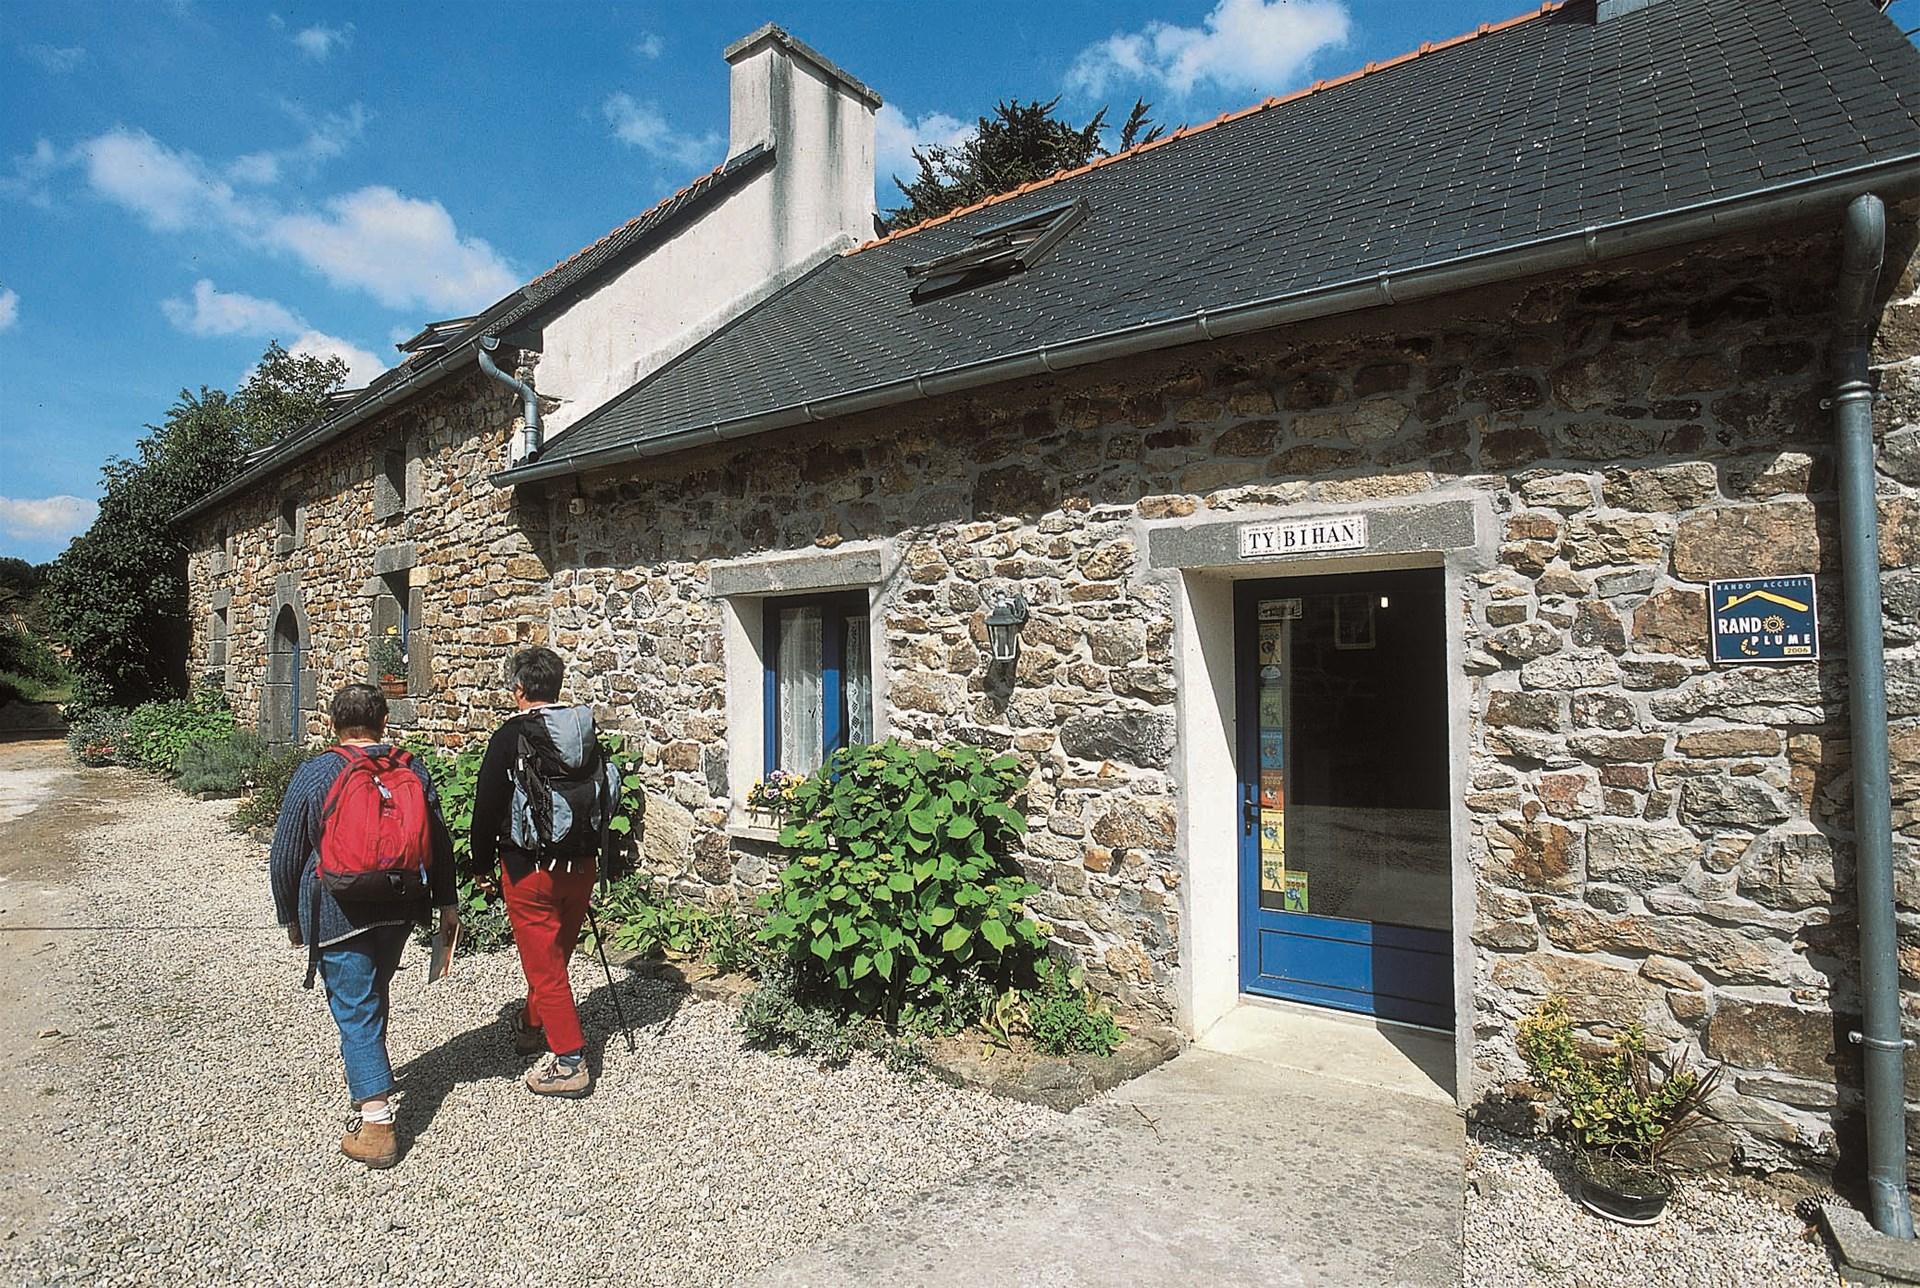 FFRandonnée - GR34 - Randonner - Bretagne - itinérance - séjour rando - hébergement